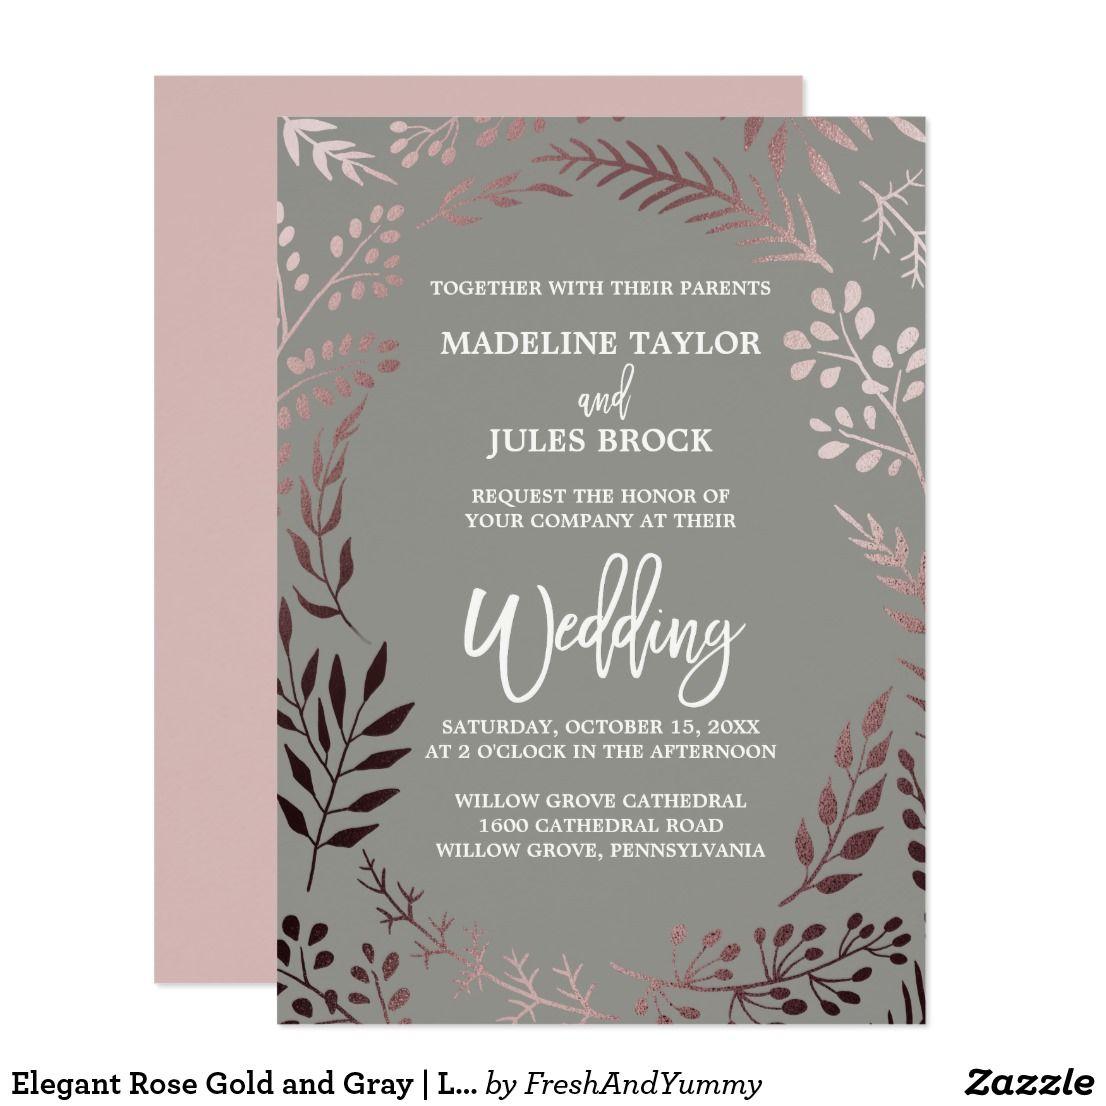 Elegant Rose Gold And Gray Leafy Frame Wedding Invitation Zazzle Com Floral Wedding Invitations Popular Wedding Invitations Wedding Invitations